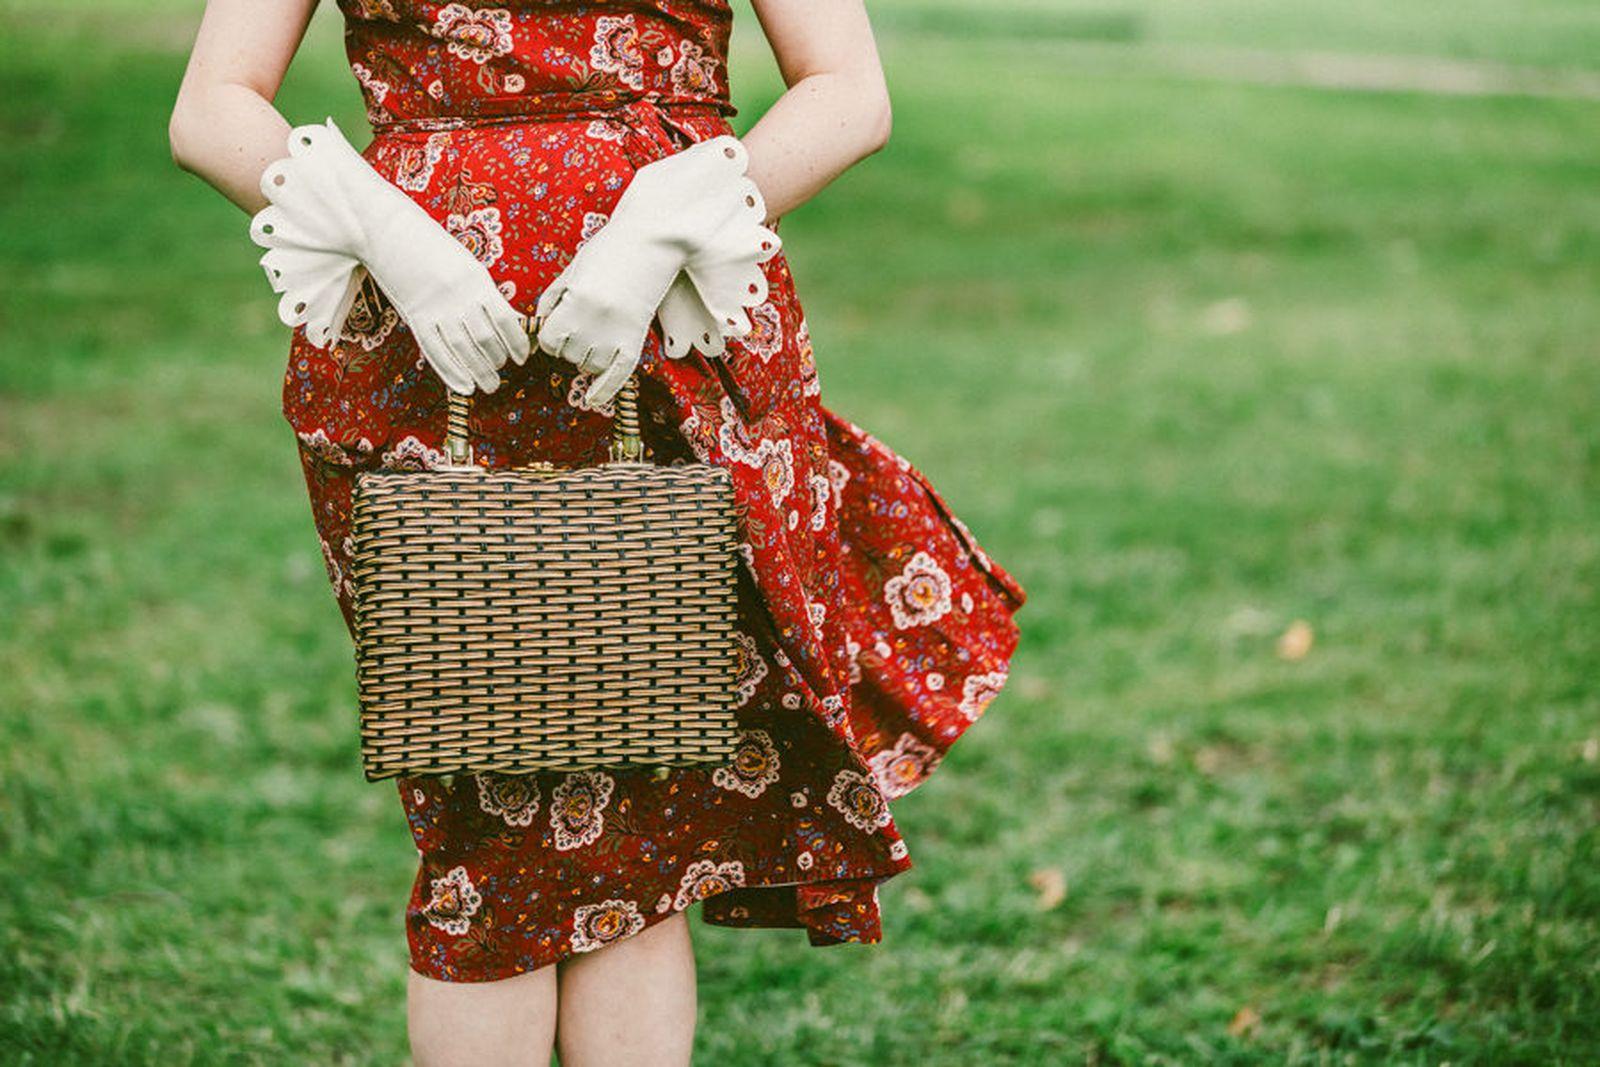 Lovely Gloves + Picnic Baskets